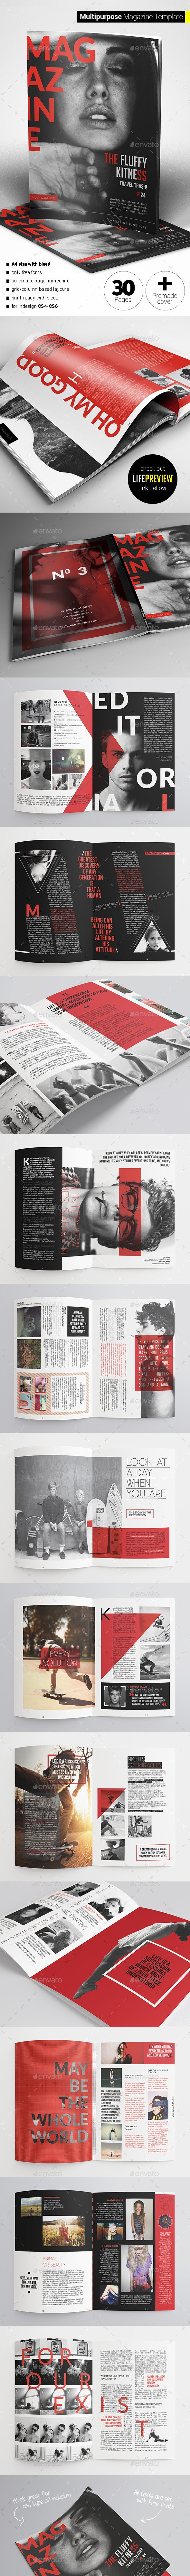 30 Pages Multipurpose Magazine - Magazines Print Templates